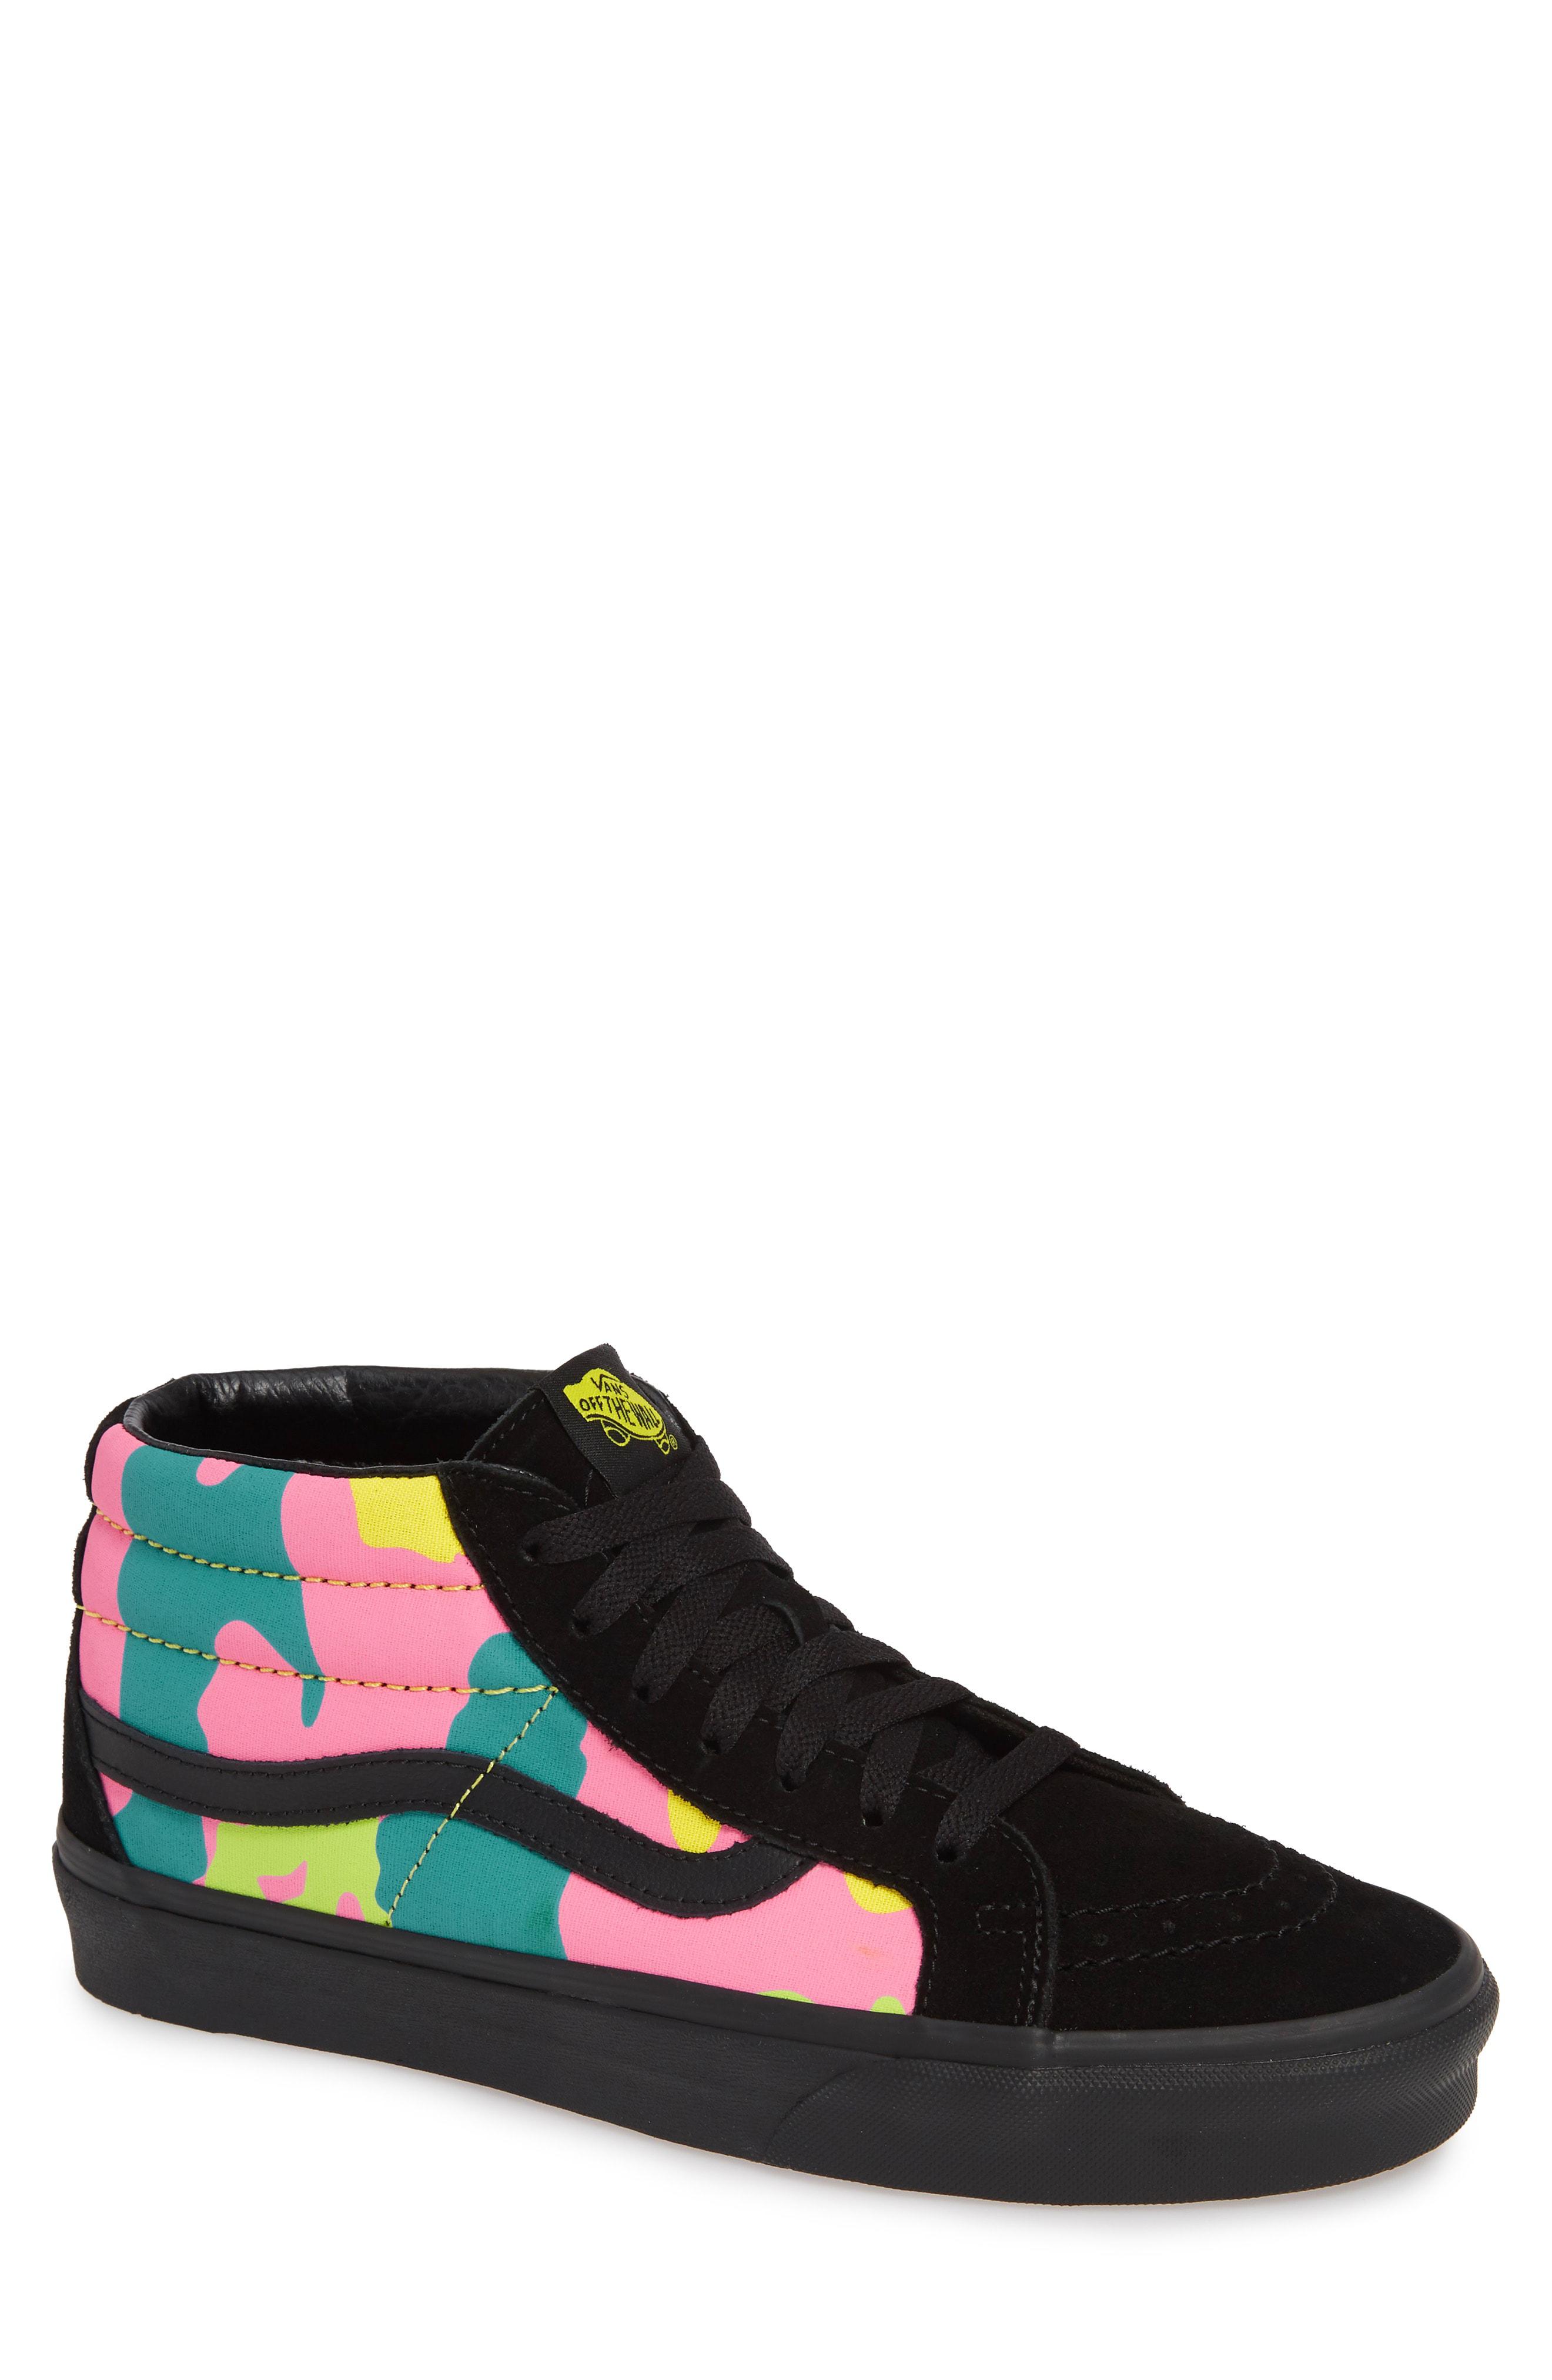 b0bdabb6ae9 Vans Sk8 Mid Reissue Neon Camo Sneaker In Multi Camo  Black